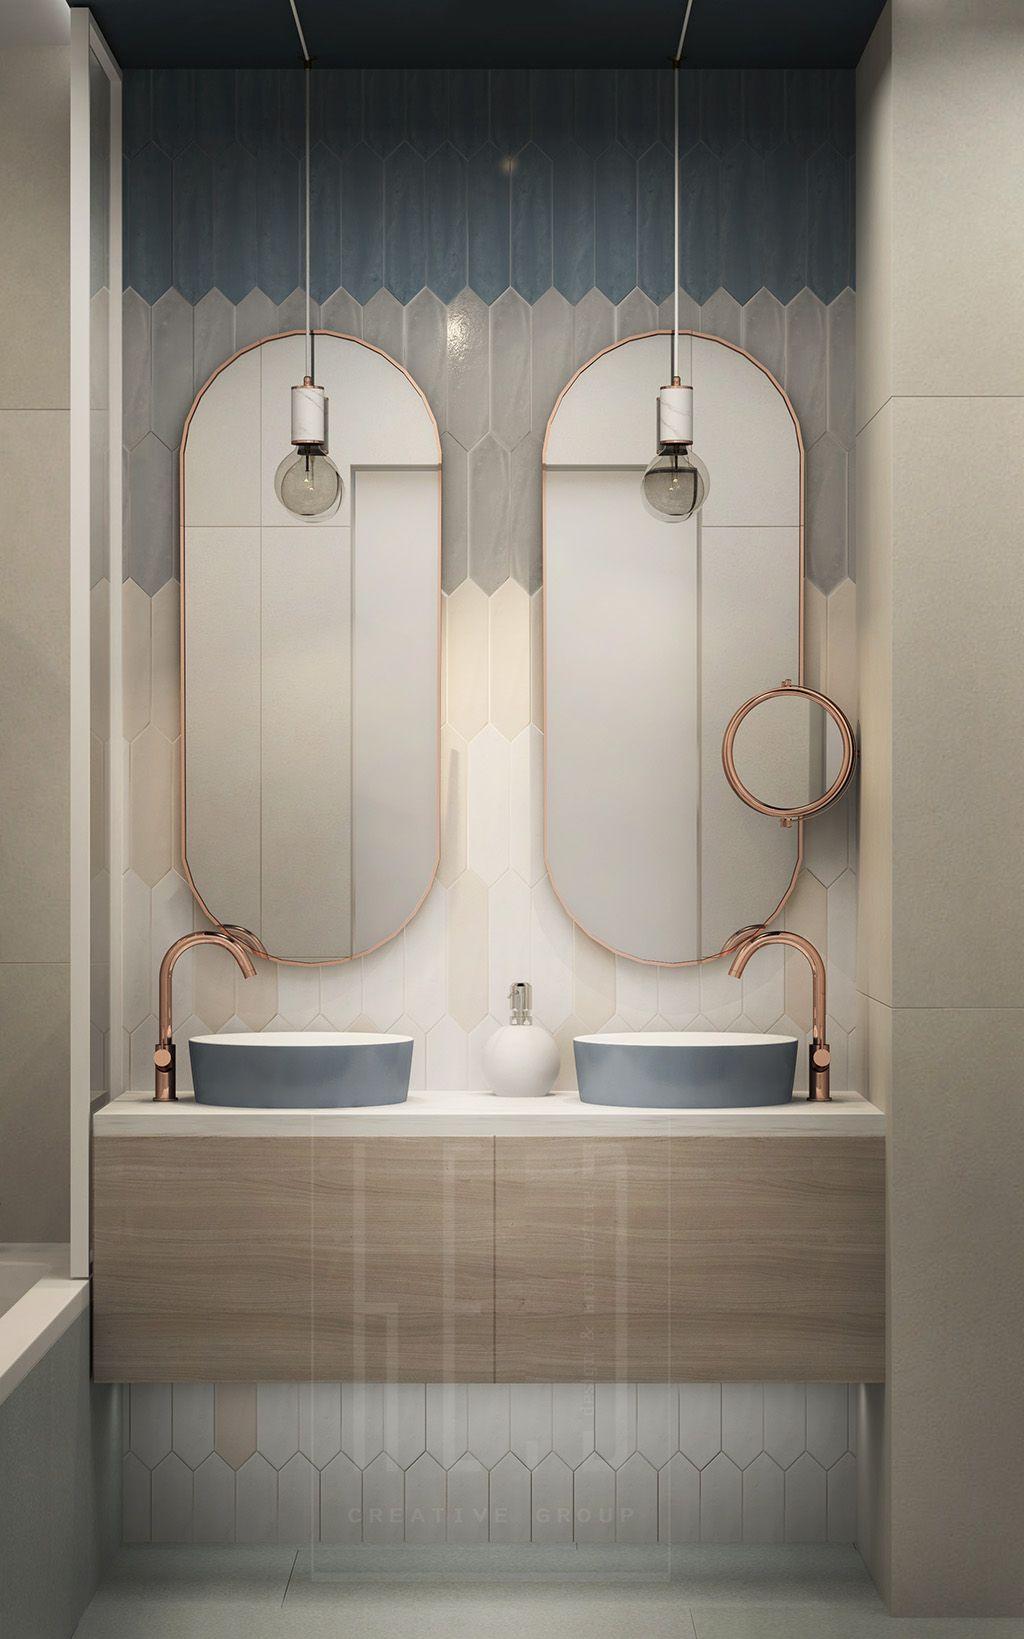 Diseño baño para matrimonio